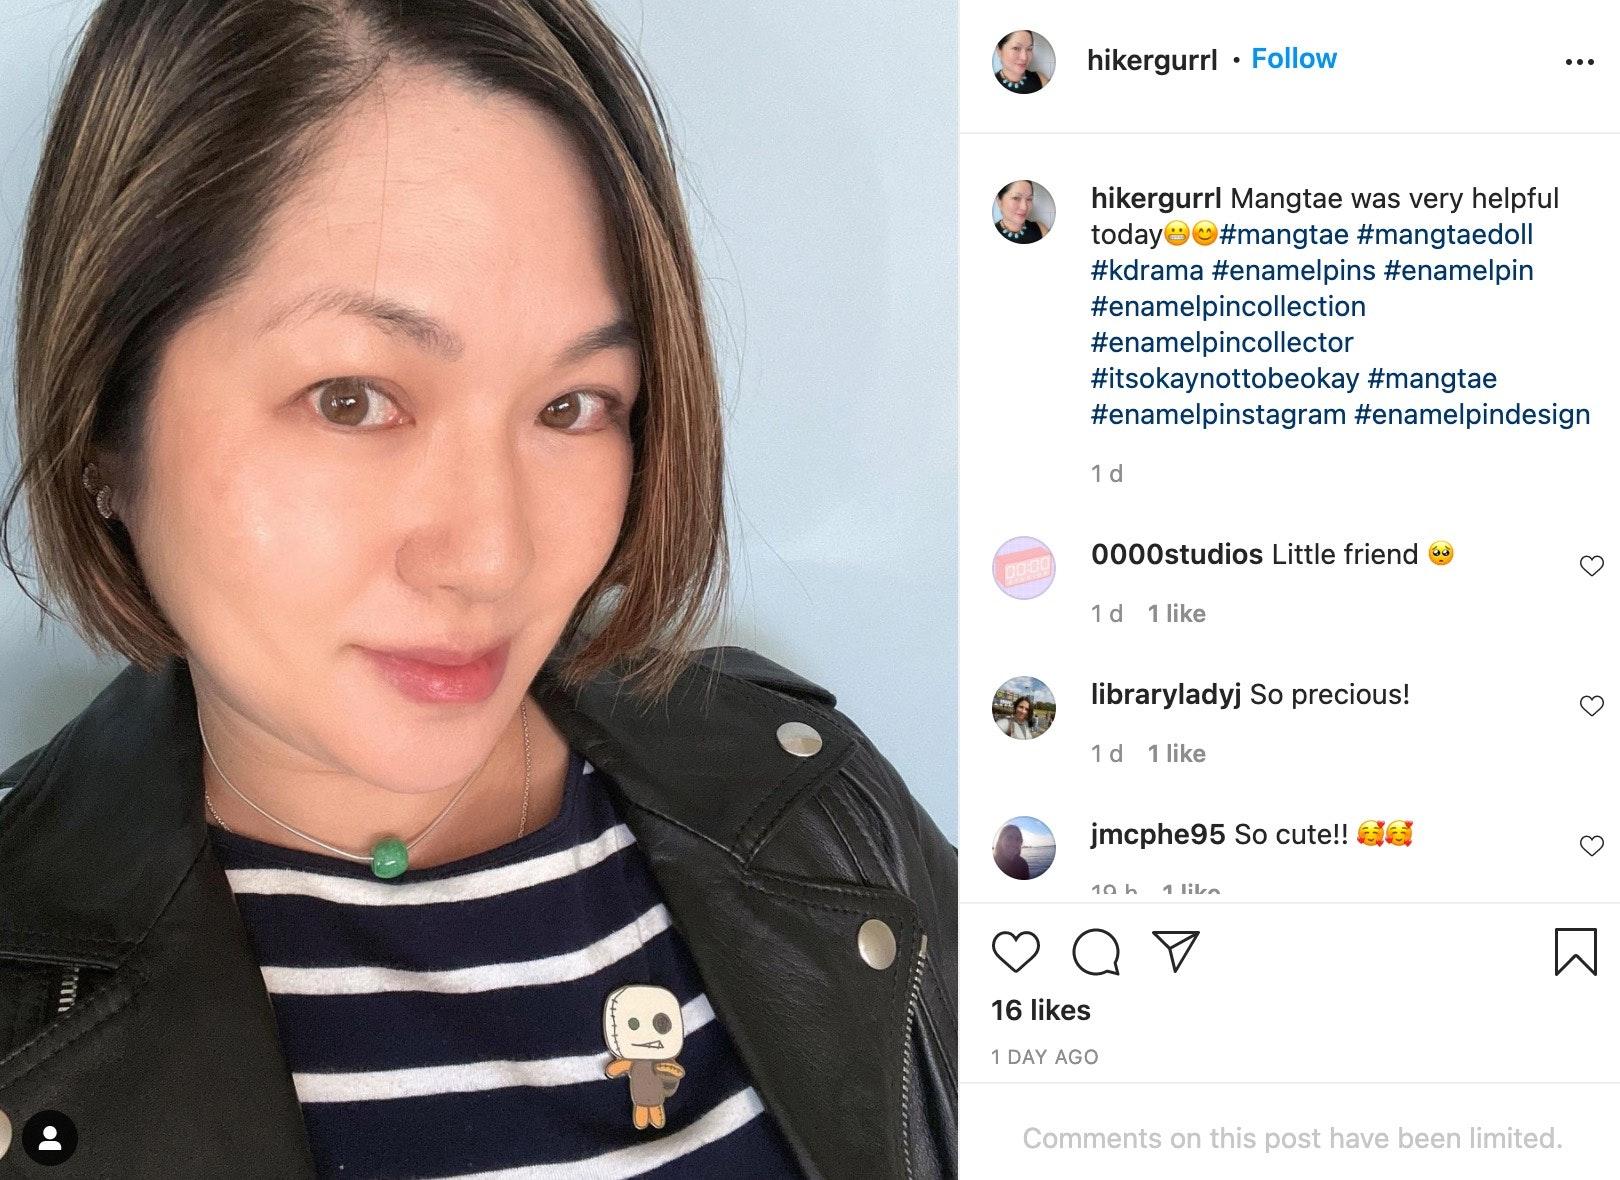 marketing enamel pins on Instagram